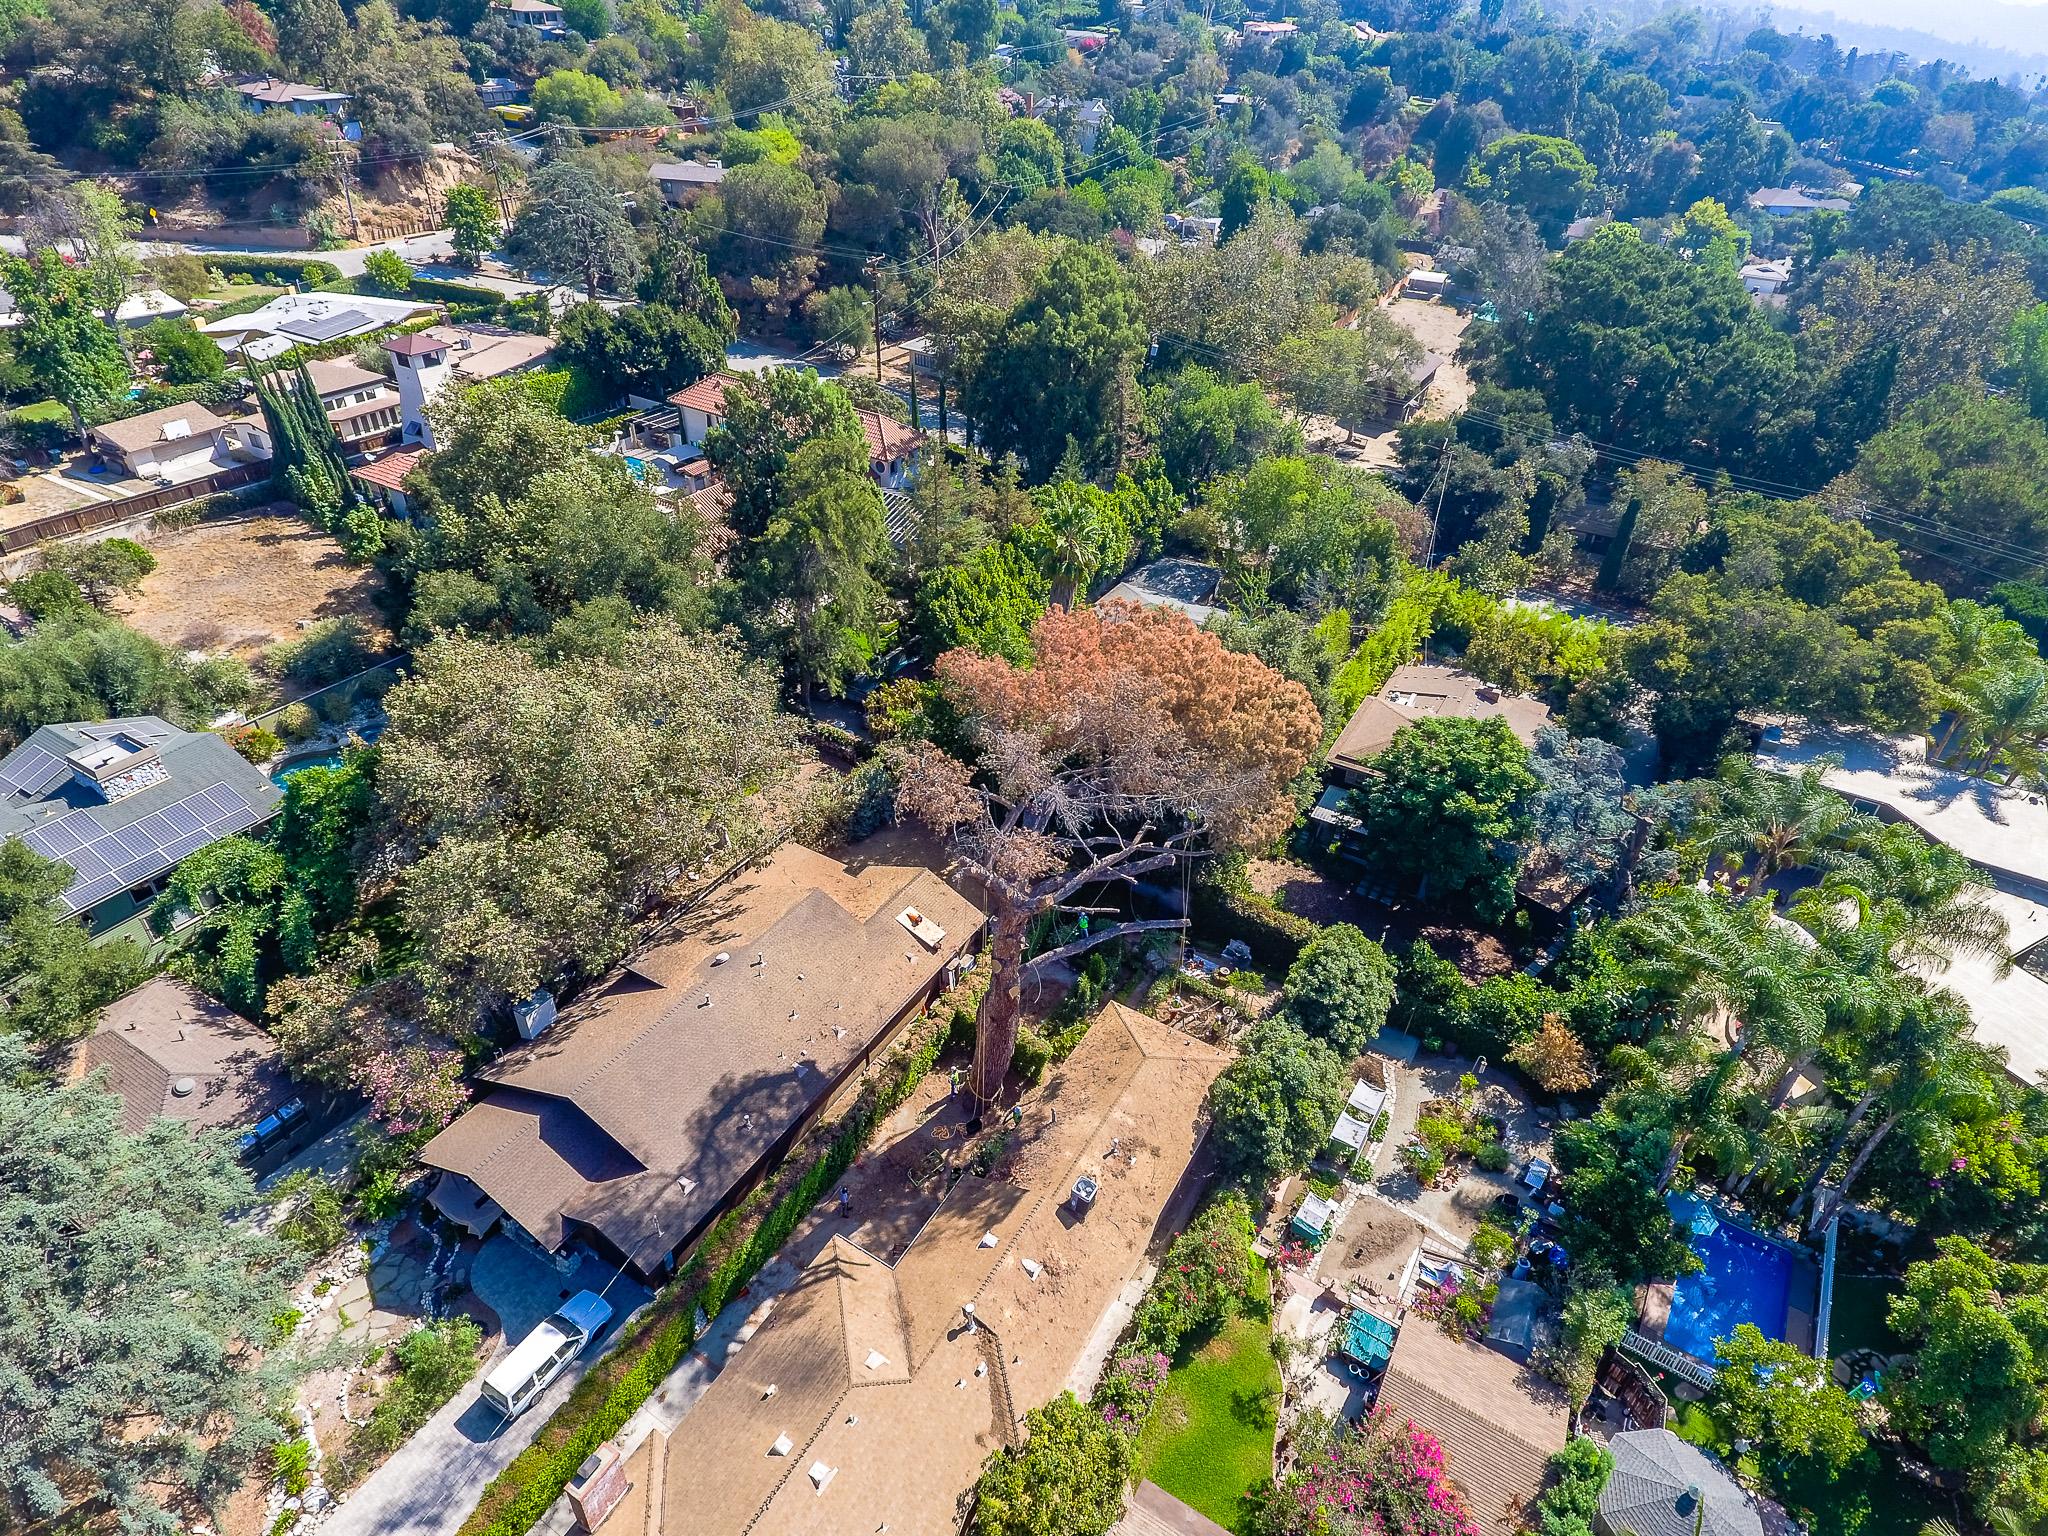 Mariposa Tree Removal Aerial 3-2.jpg